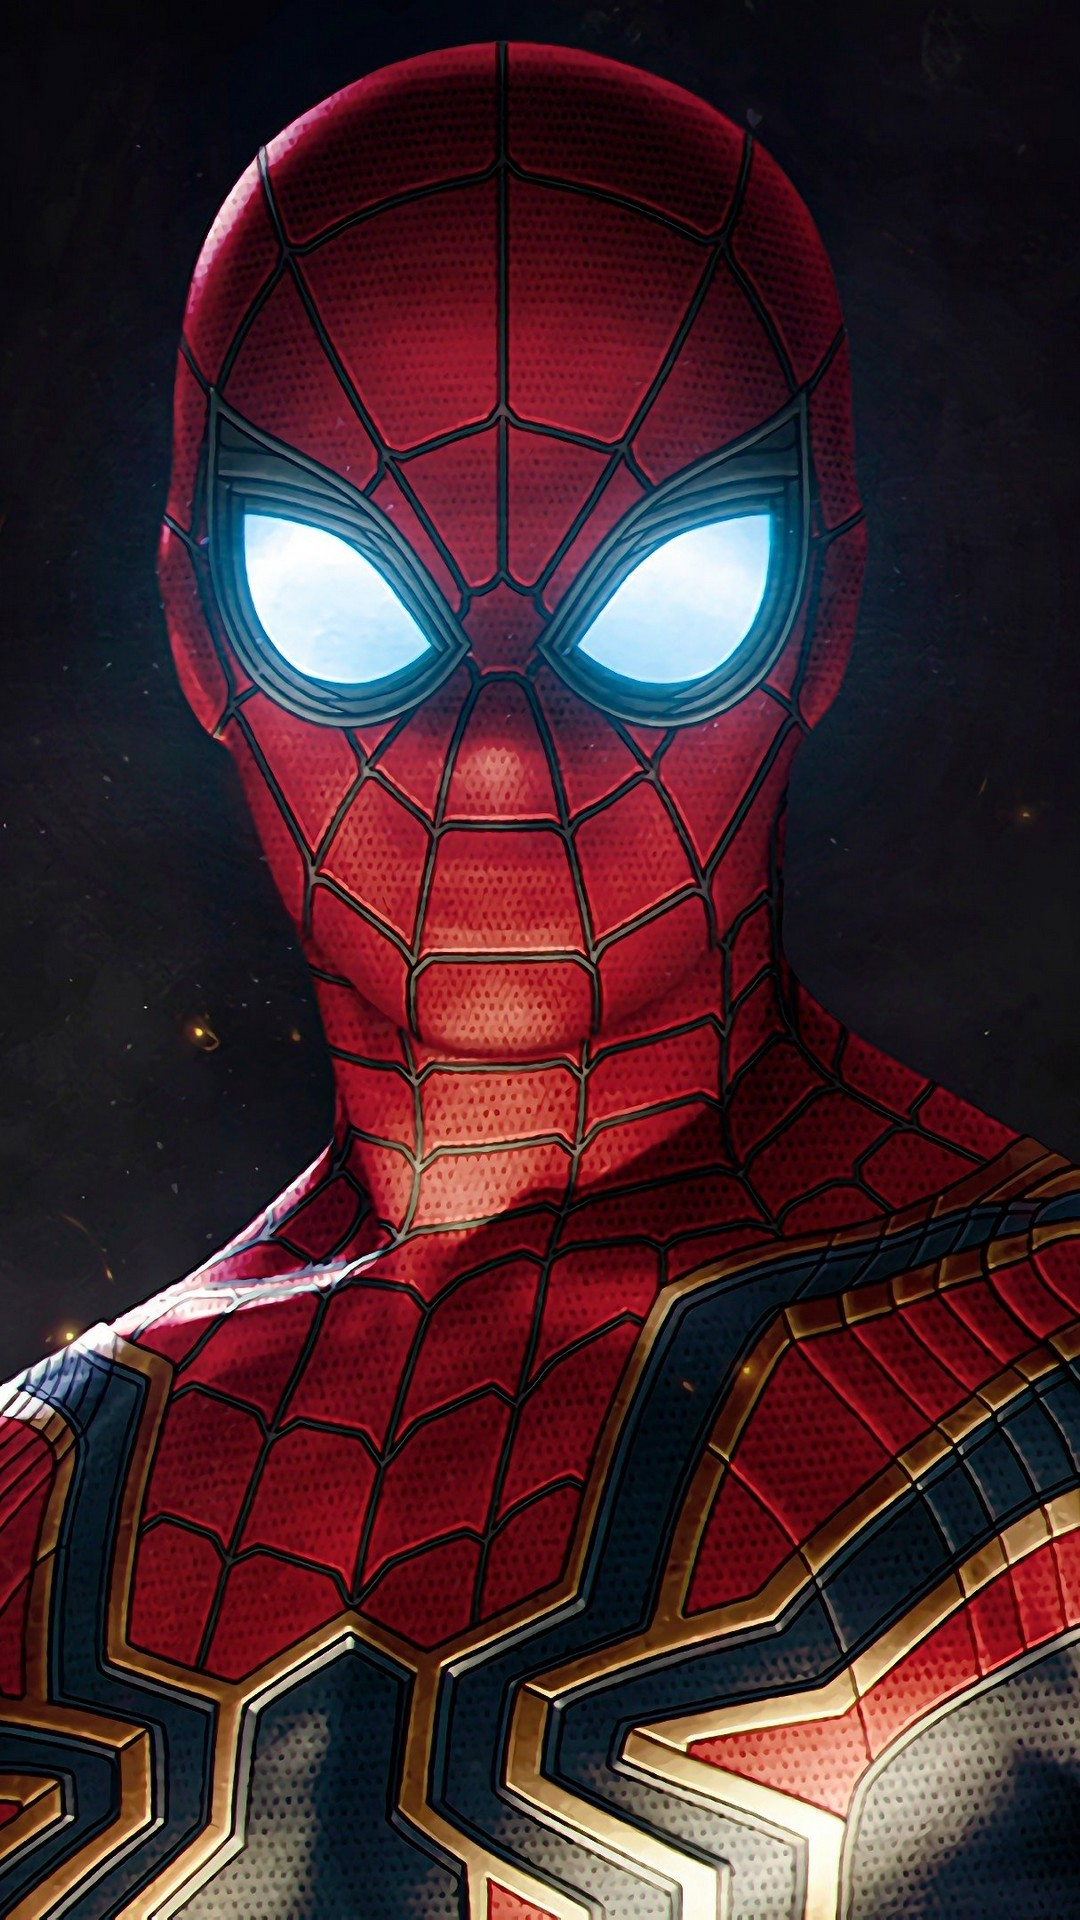 Iphone Wallpaper Hd Avengers - Iphone Wallpaper